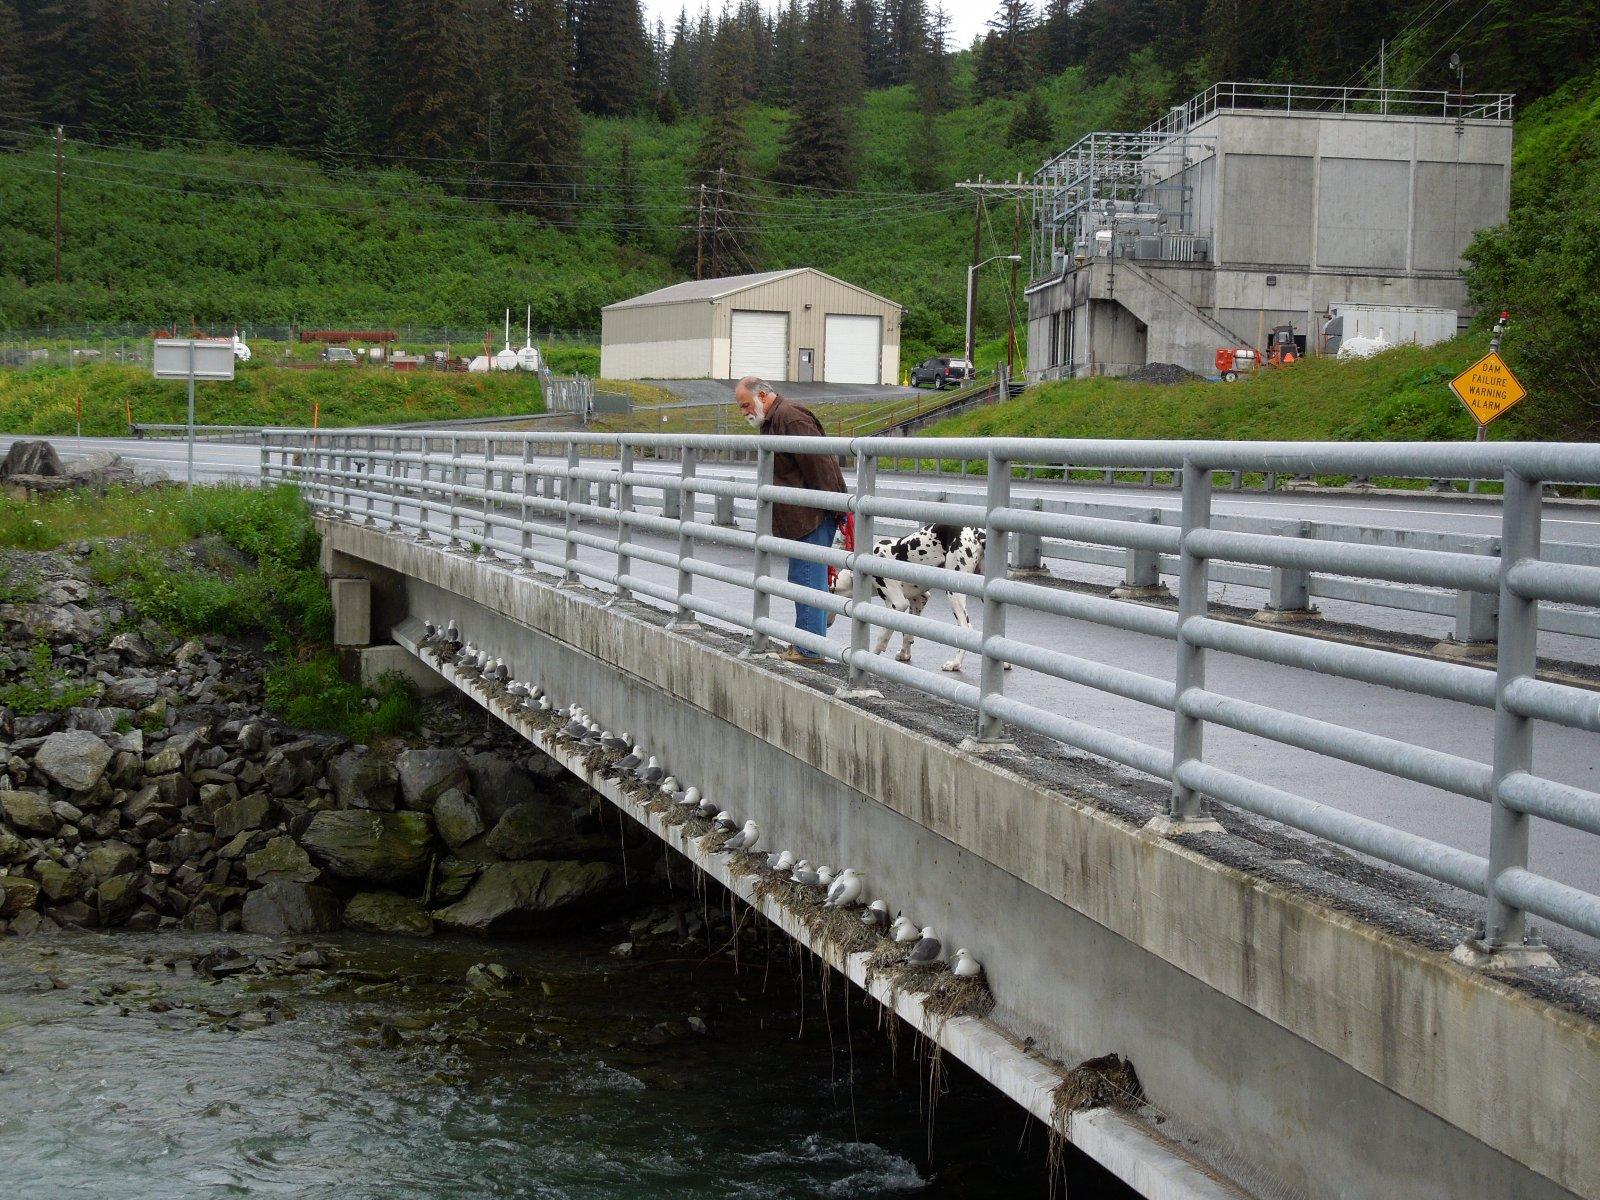 Click image for larger version  Name:Valdez to Copper River Center 063.jpg Views:58 Size:490.4 KB ID:215367